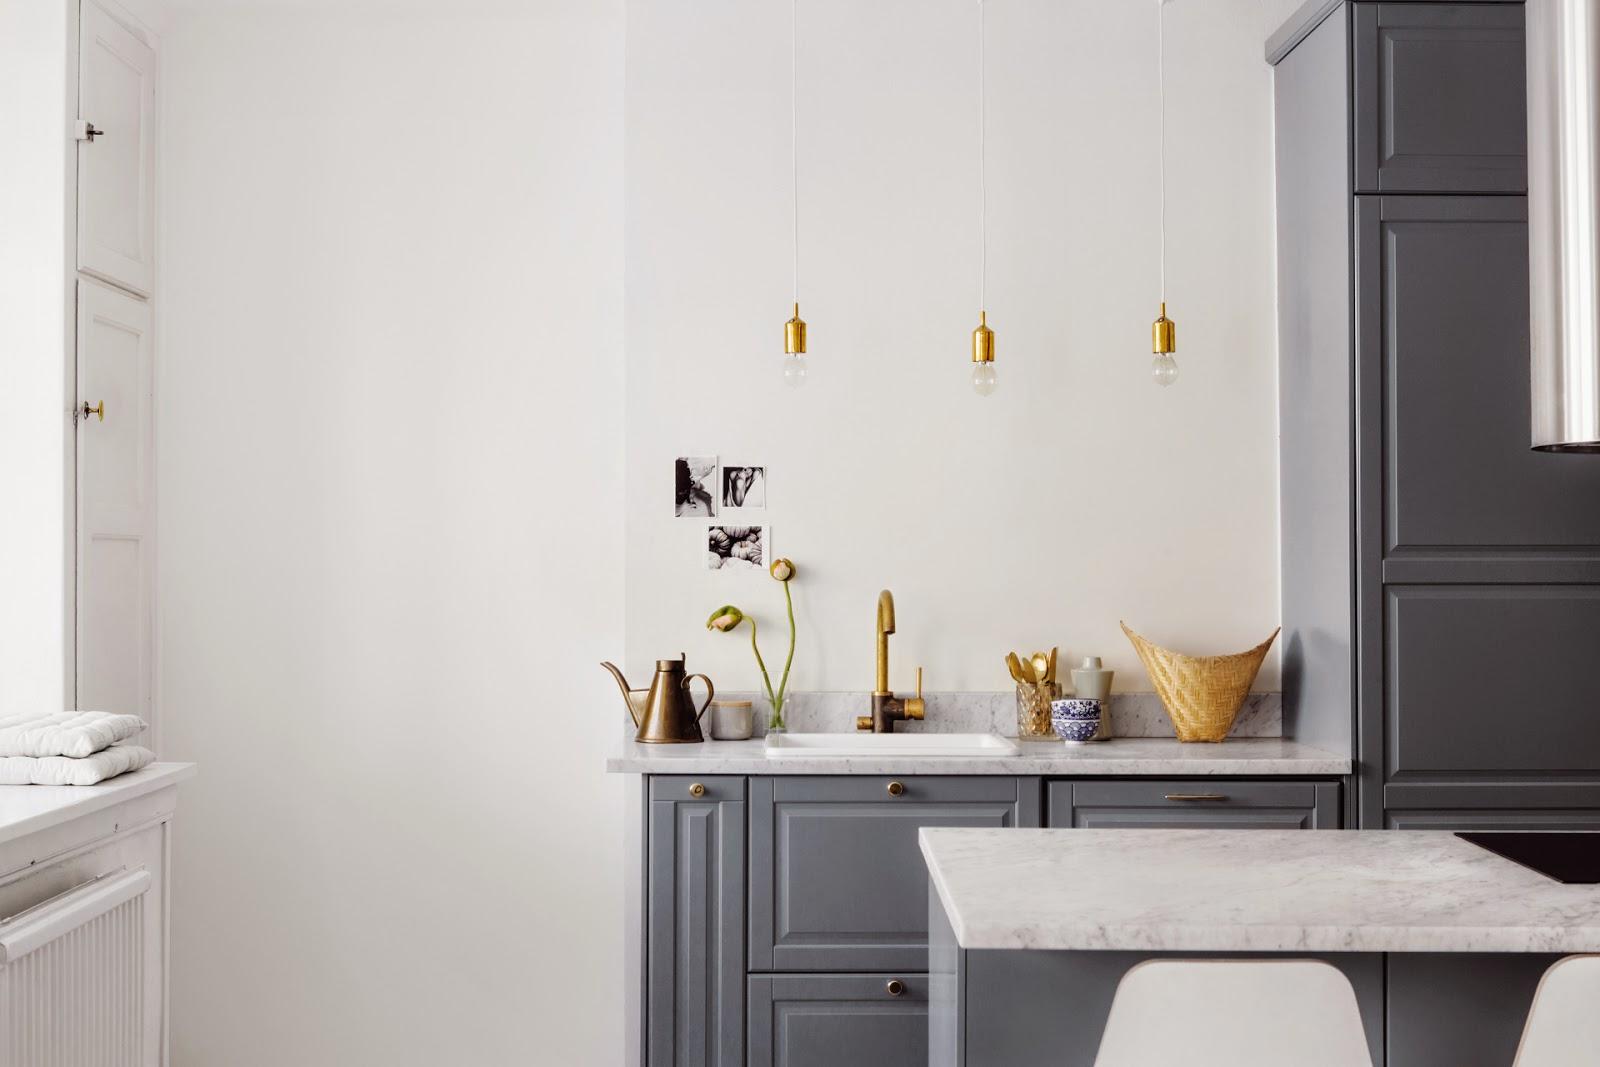 une cuisine en marbre et or frenchy fancy. Black Bedroom Furniture Sets. Home Design Ideas